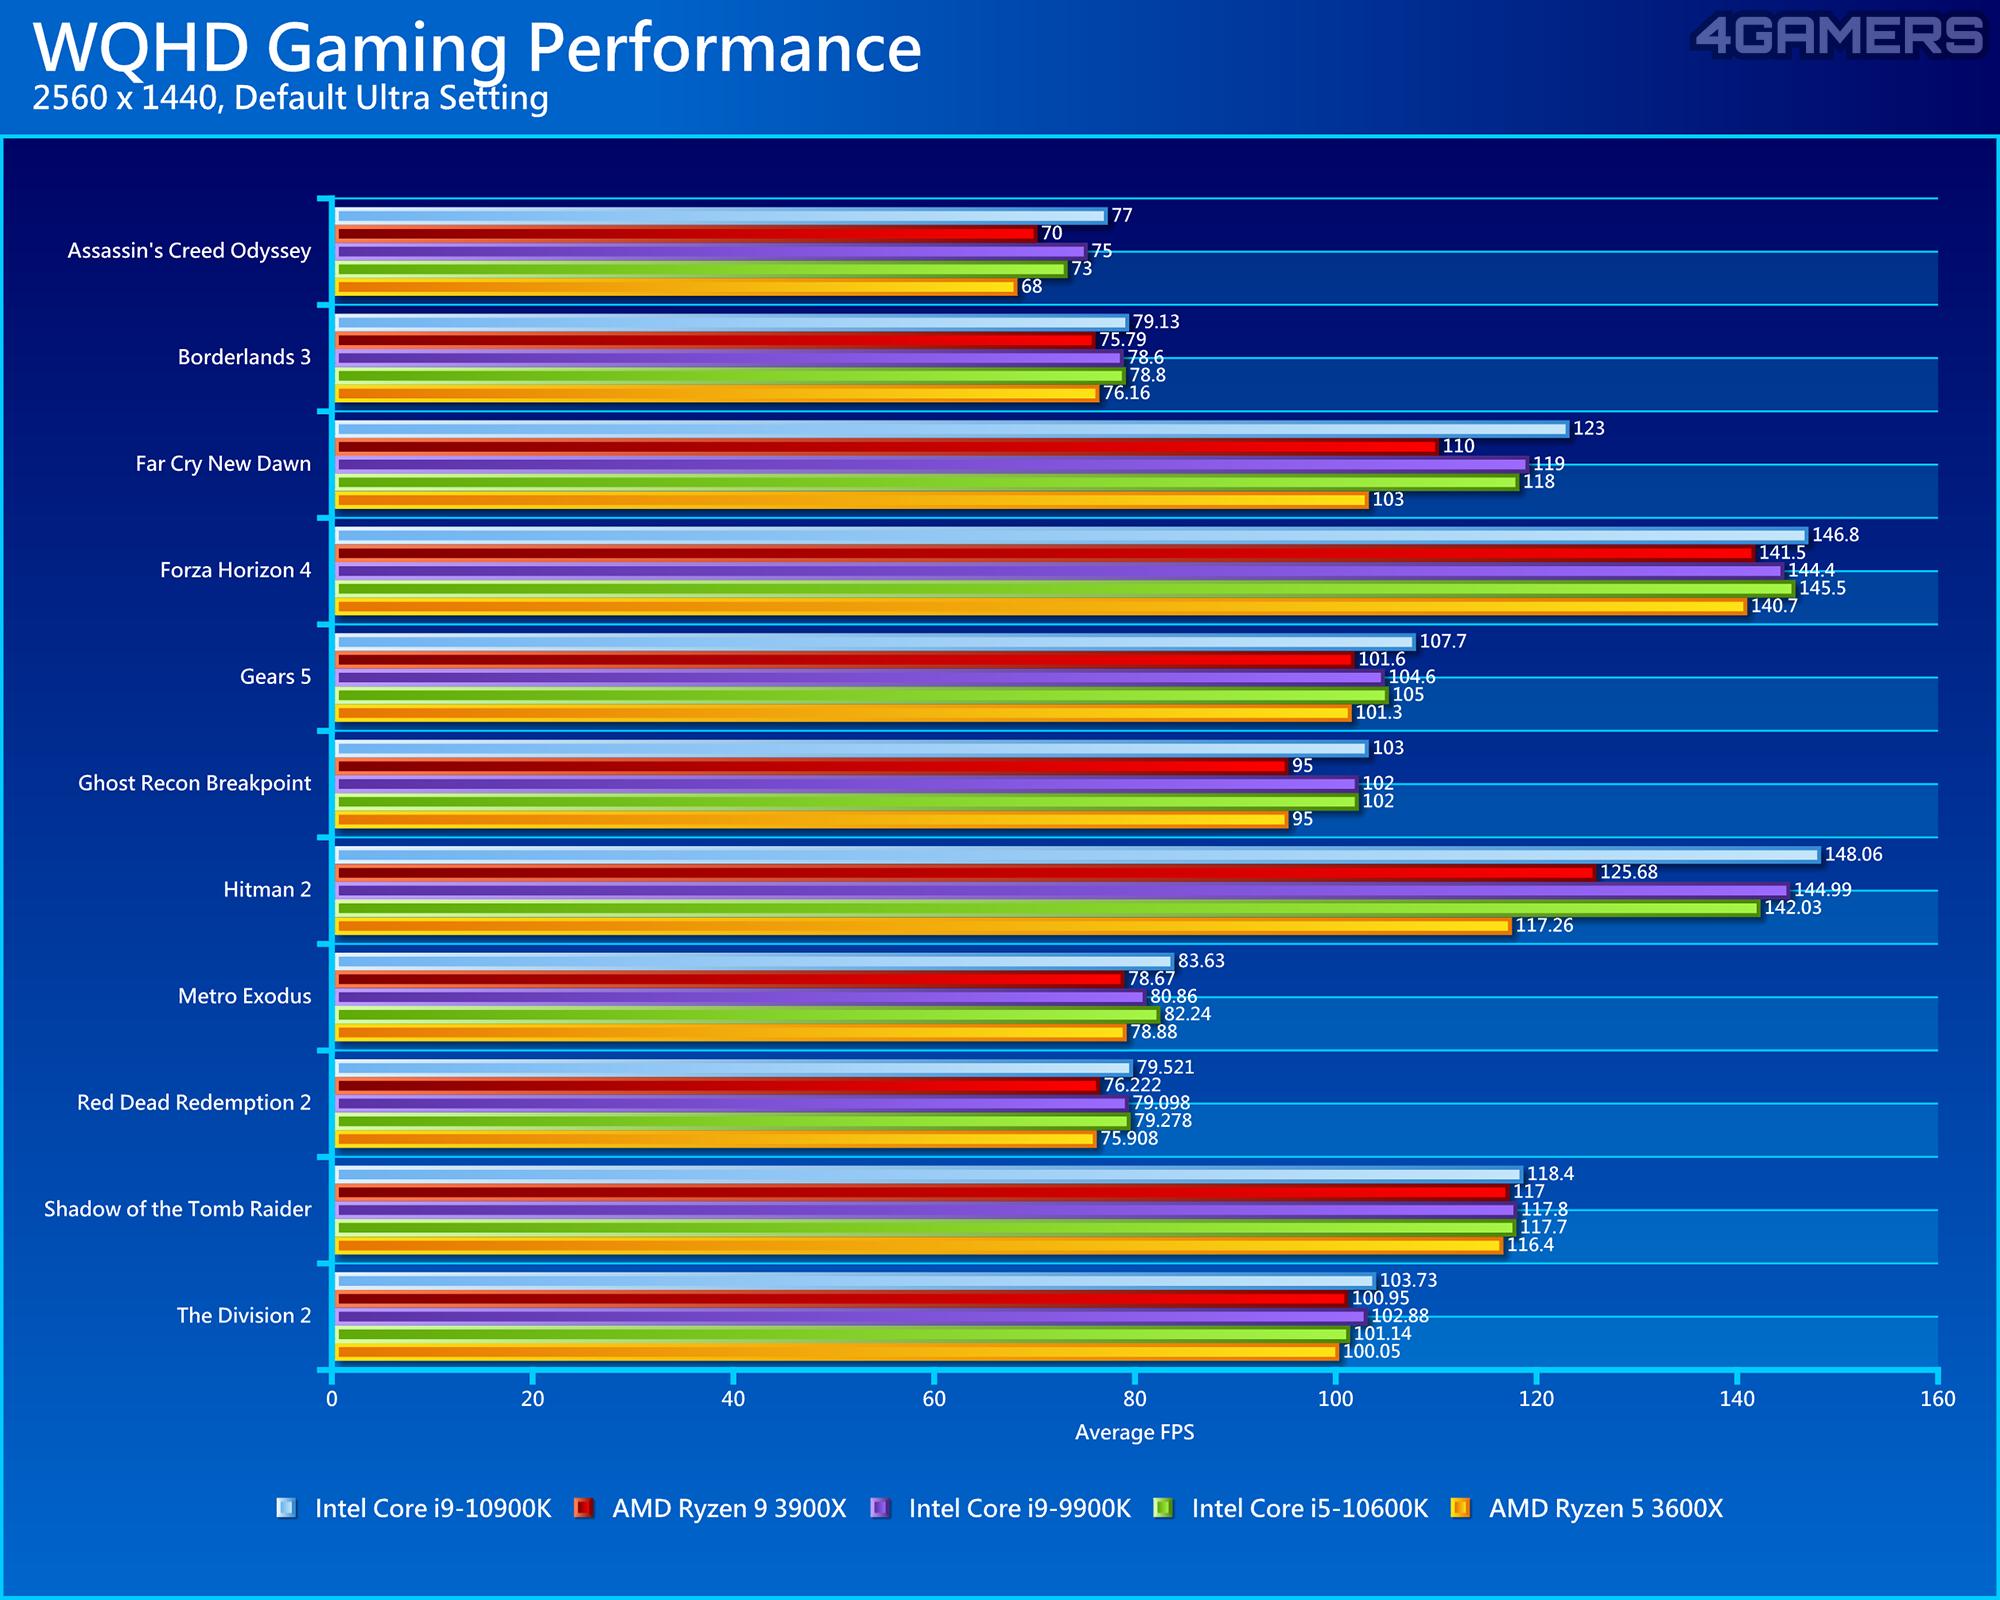 Intel Core i9-10900K & i5-10600K Performance